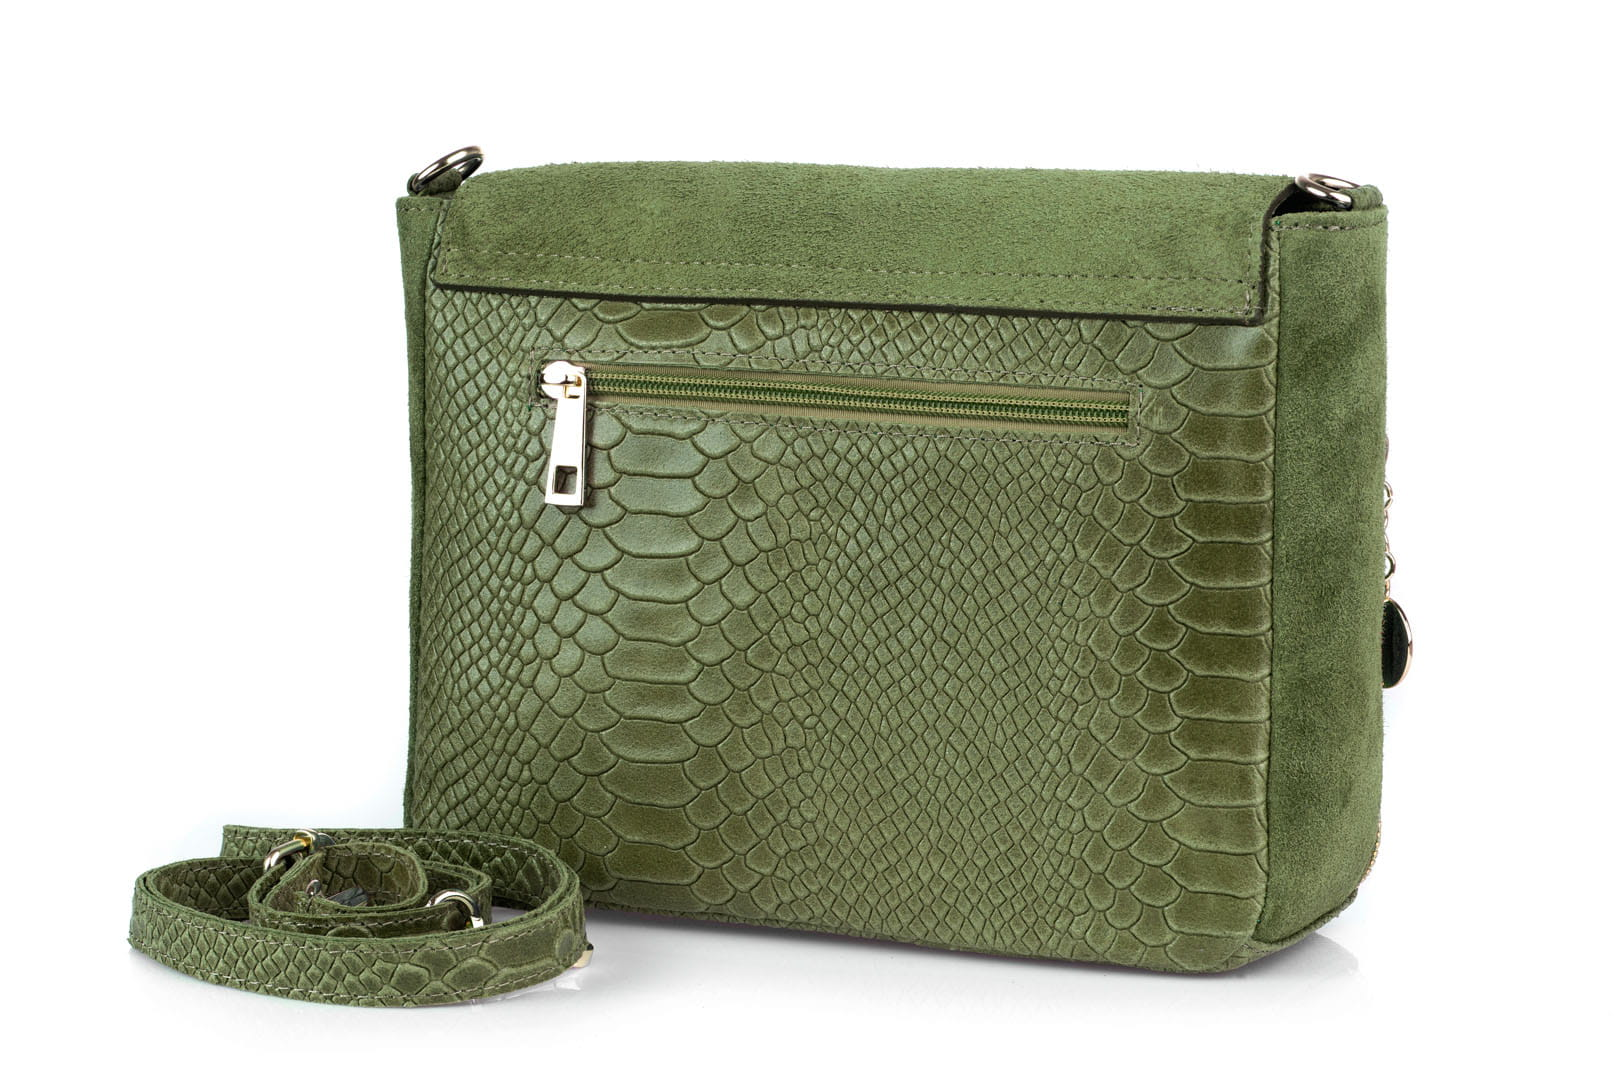 ab86a00299ae0 Torebka Damska Skórzana Vera Pelle Łuski Oliwkowa Leather Box